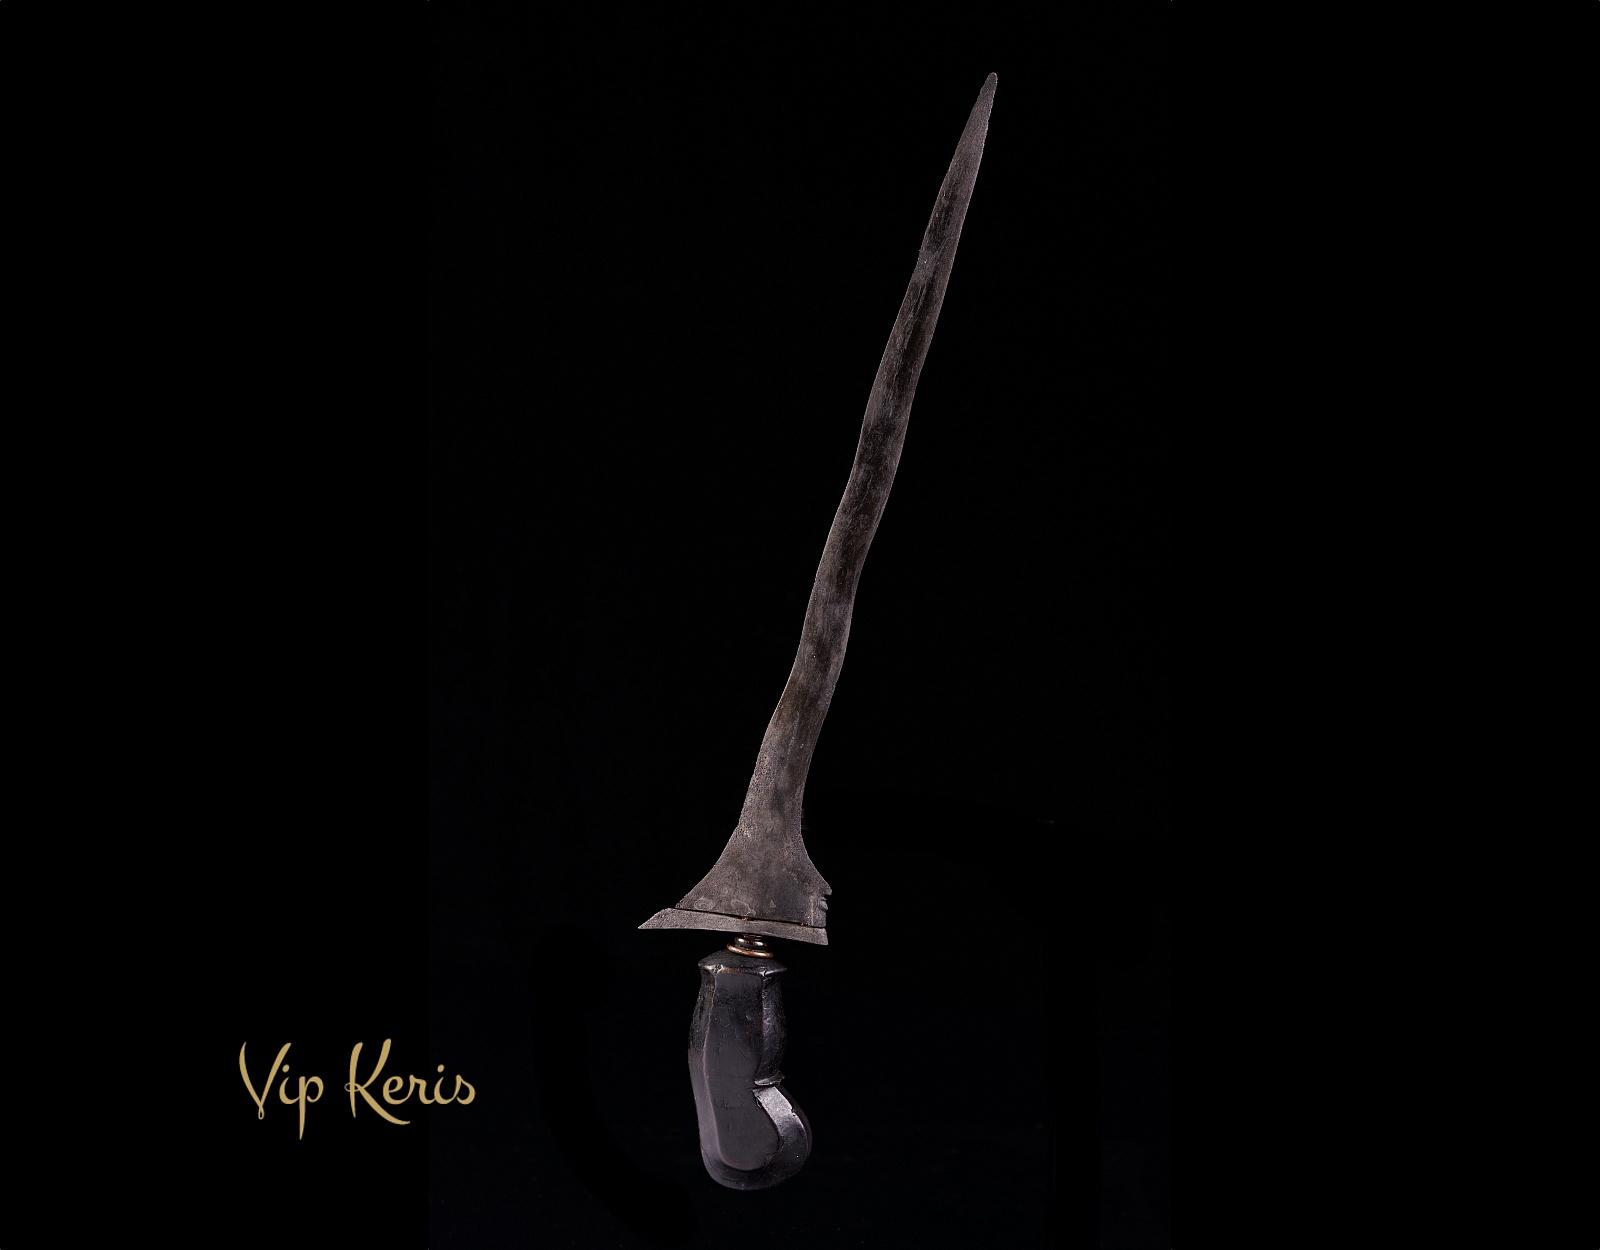 Ритуальный кинжал Крис Sempono, 13 аркан  фото VipKeris